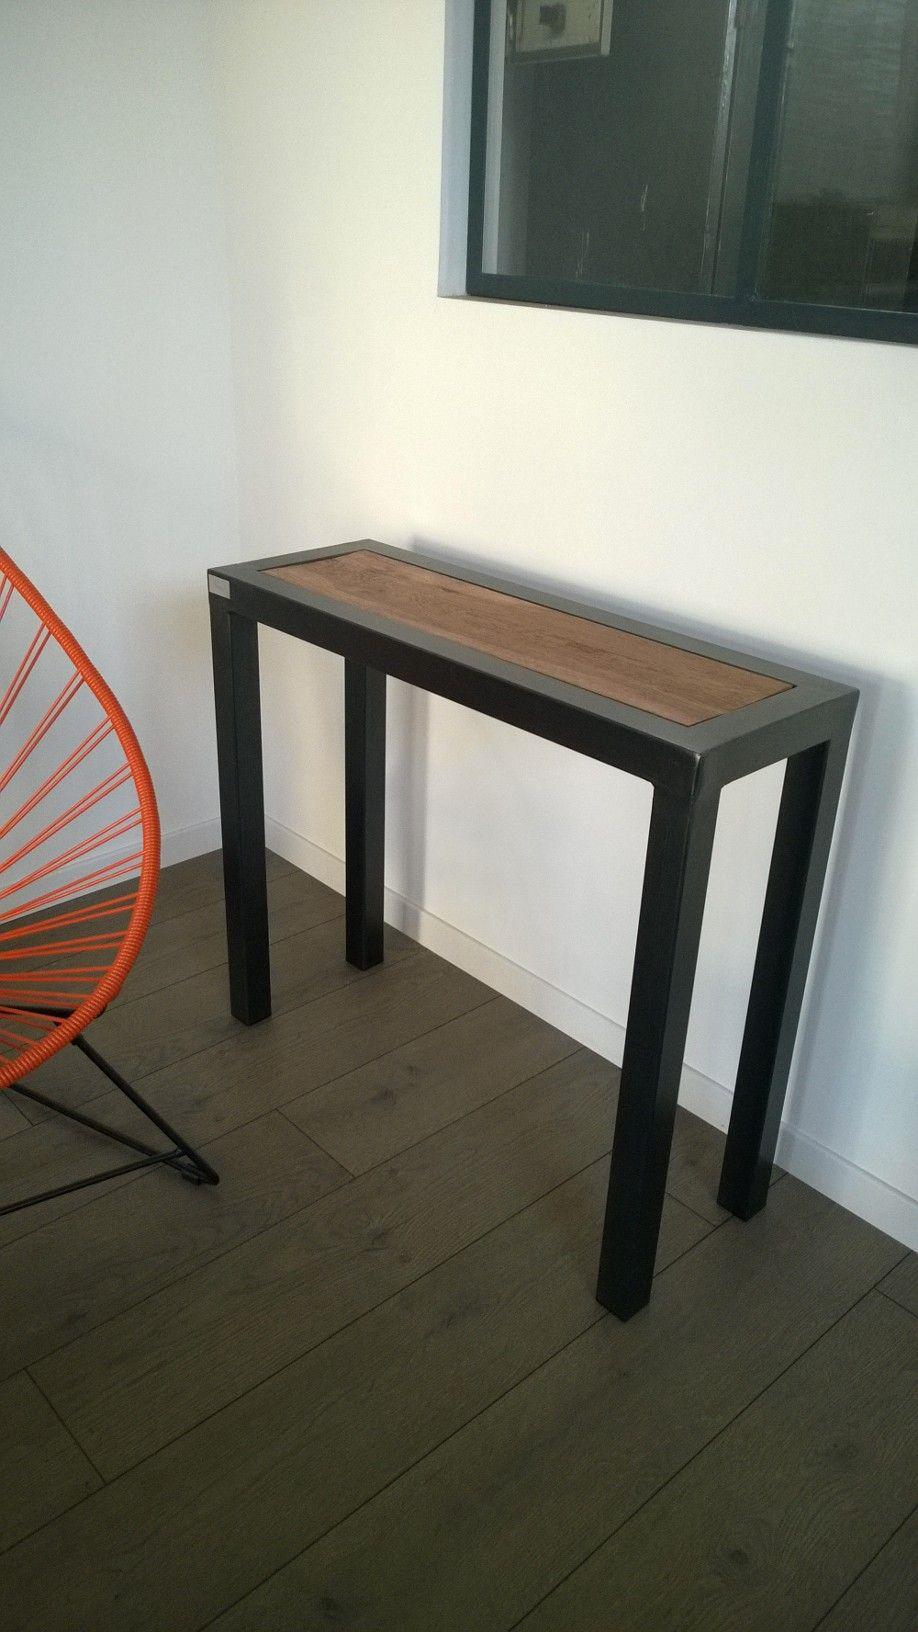 console bois m tal console industrielle console. Black Bedroom Furniture Sets. Home Design Ideas